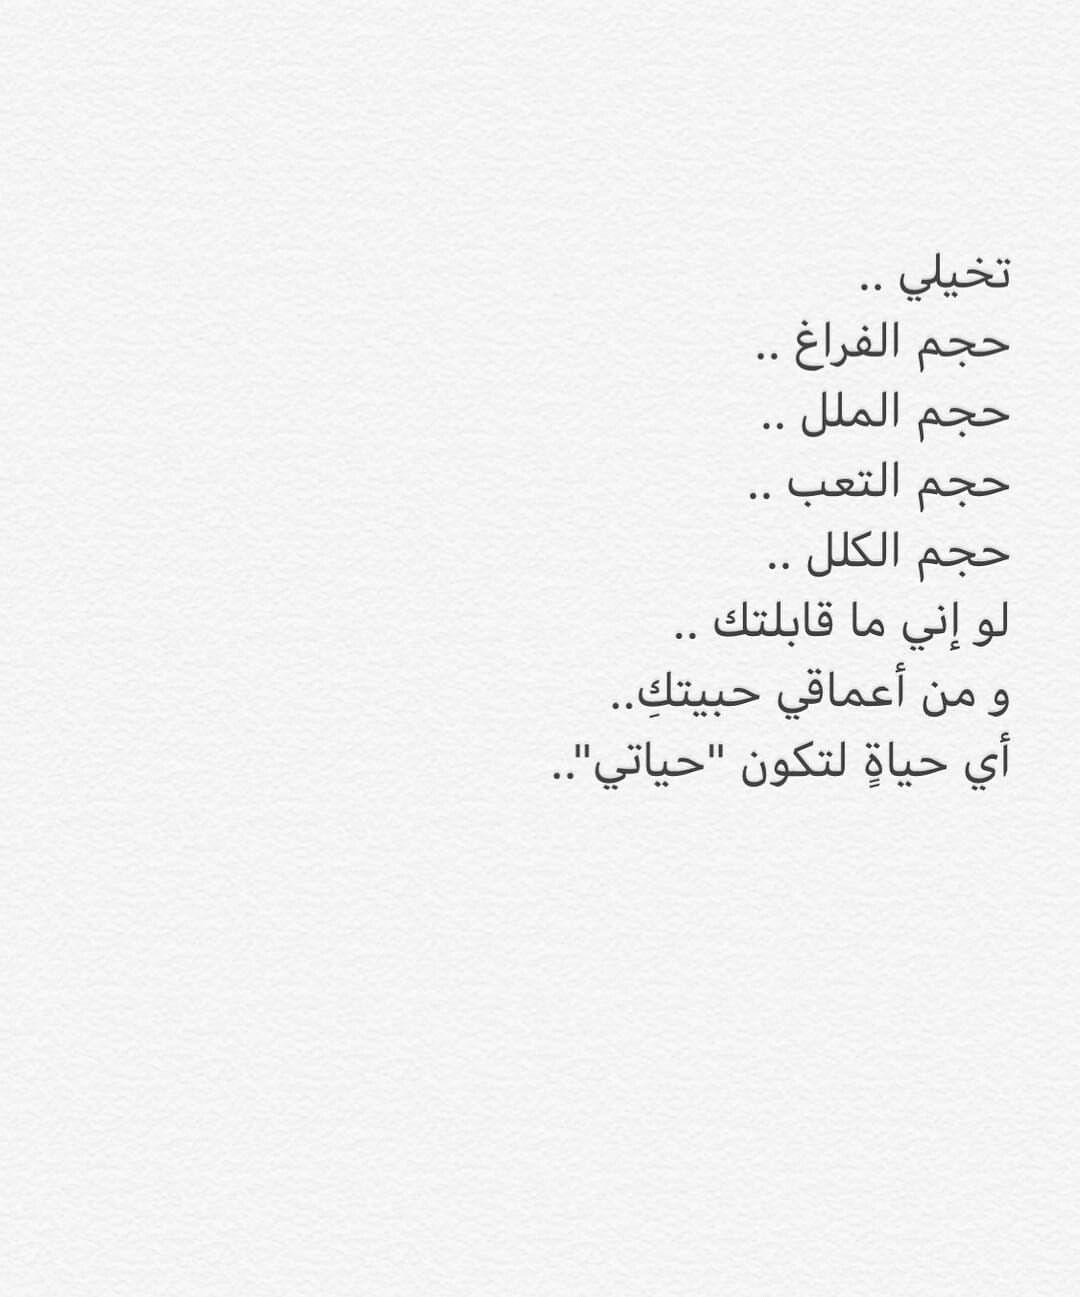 جد Words Quotes Words Quotes